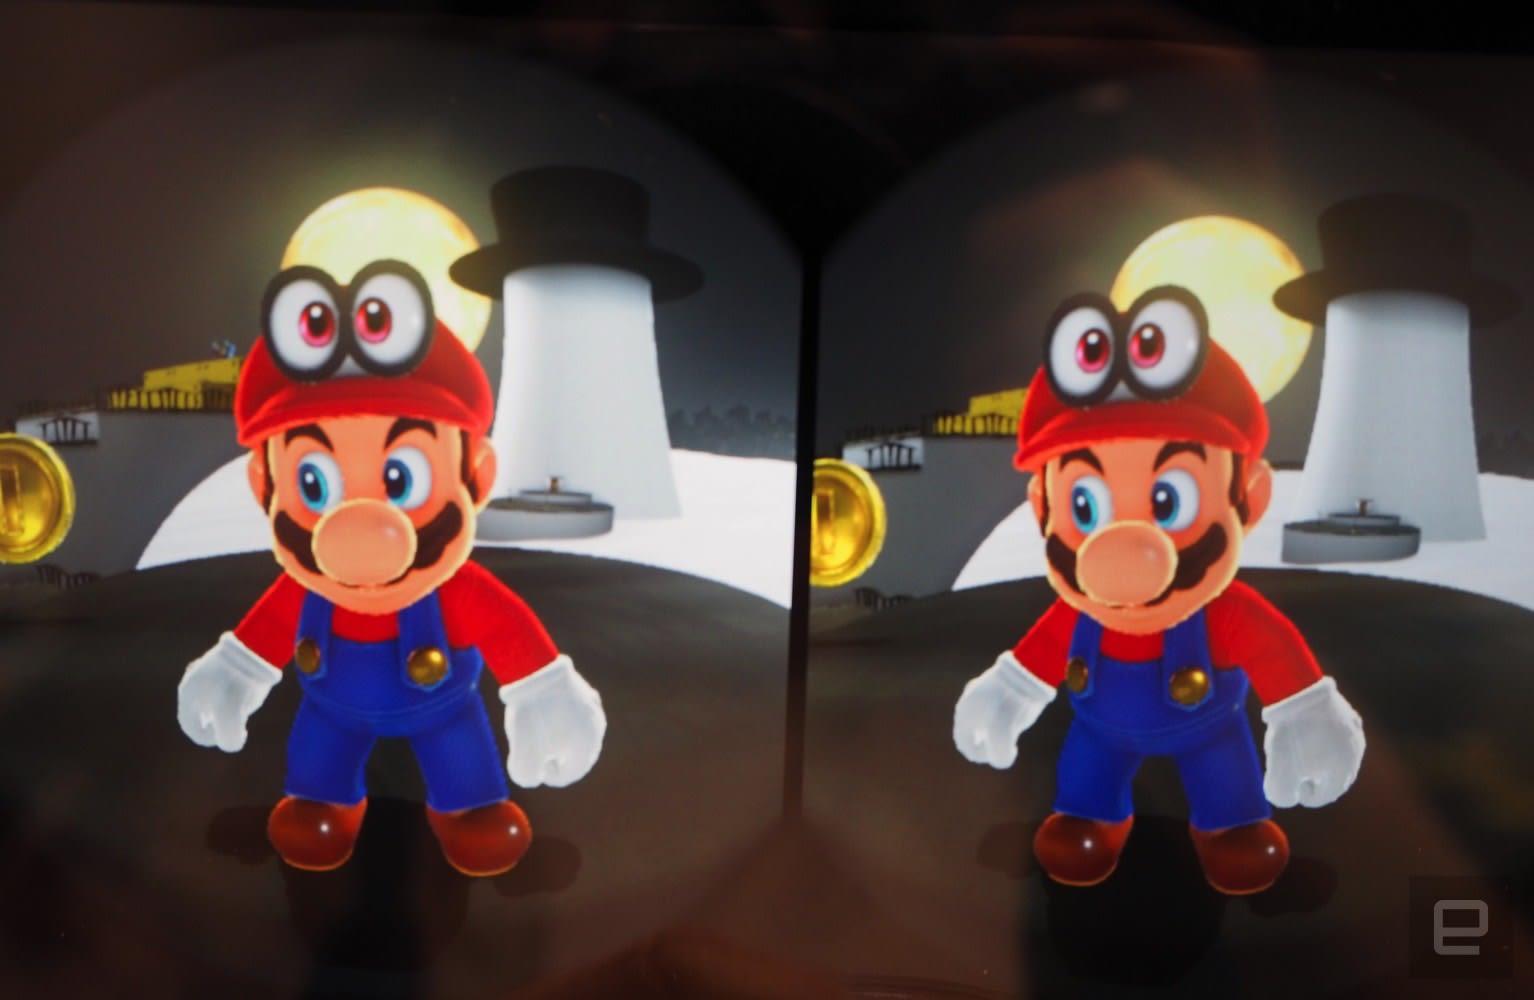 Super Mario Odyssey in VR